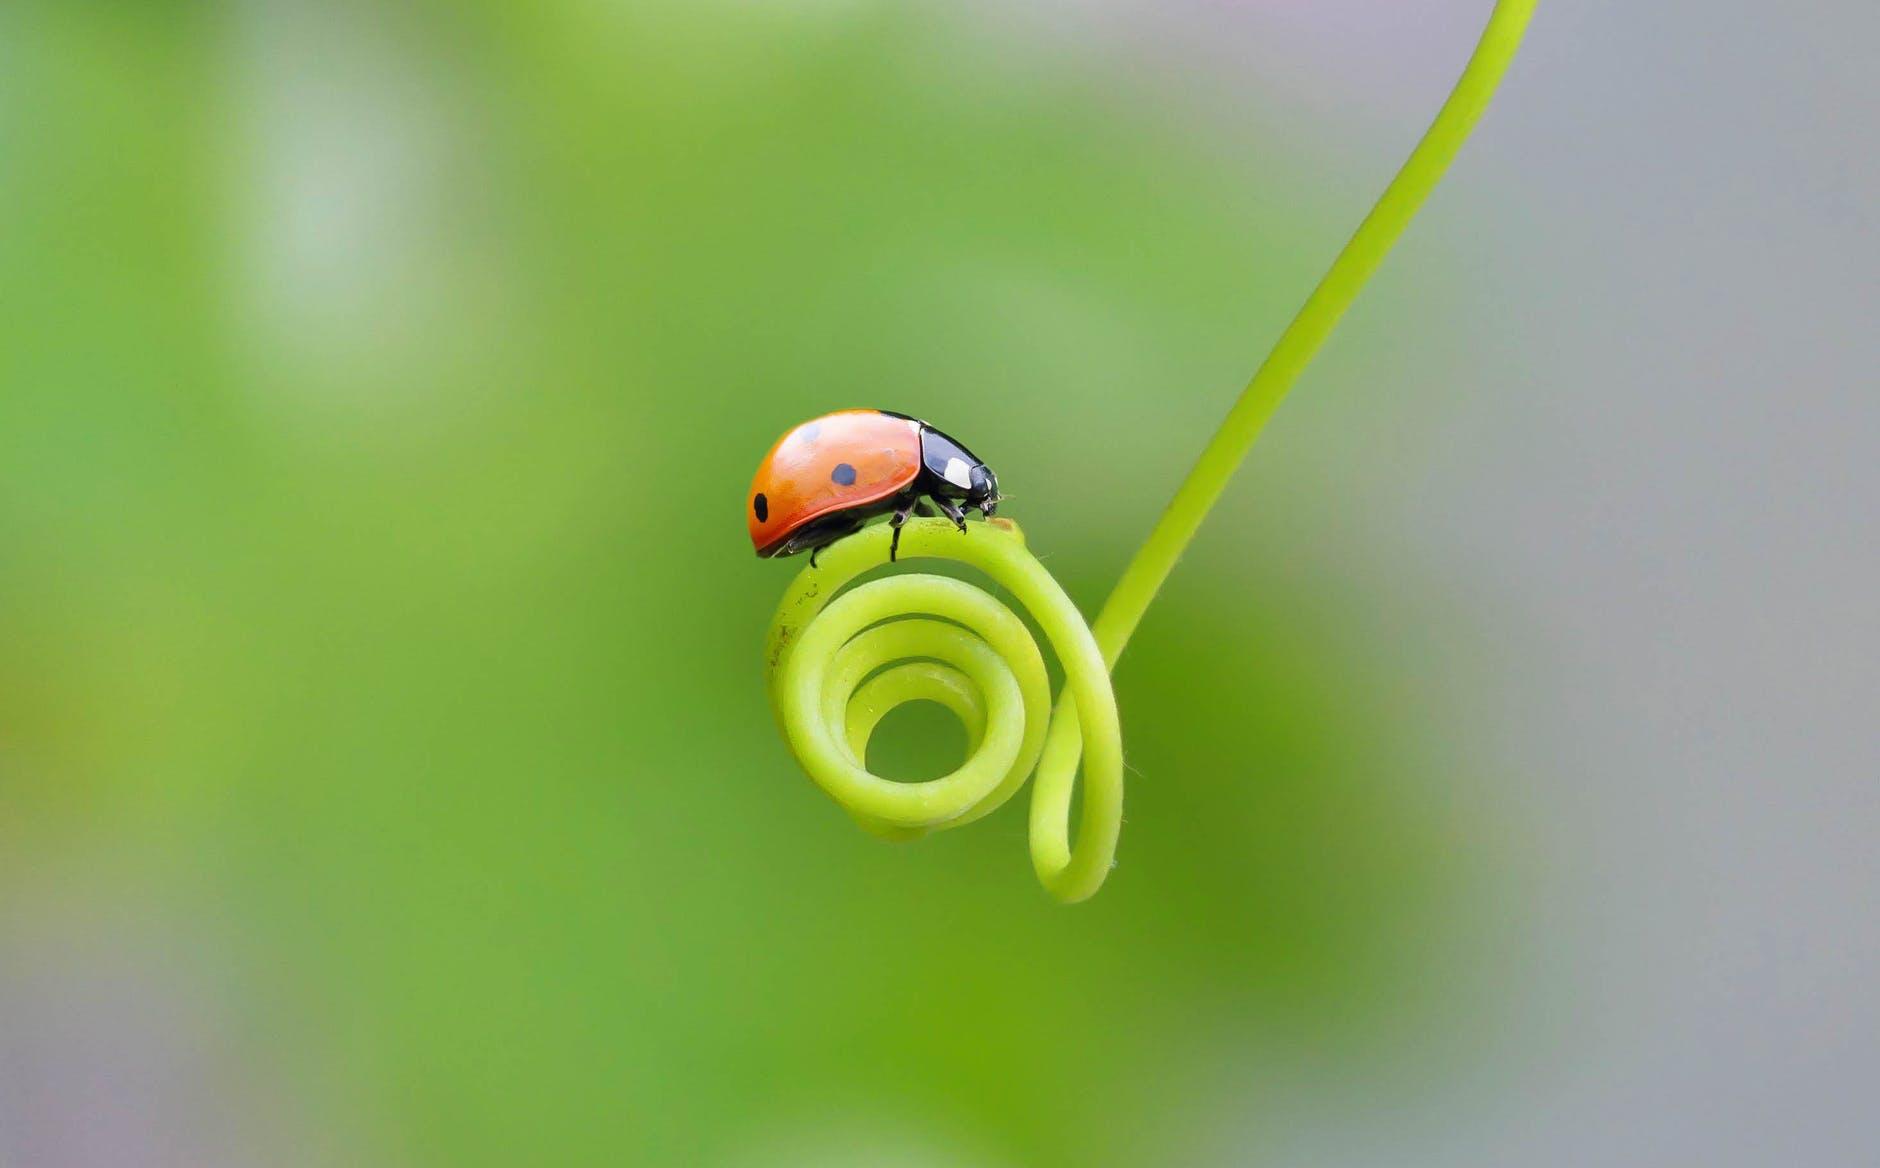 ladybug resting on a spiral plant shoot